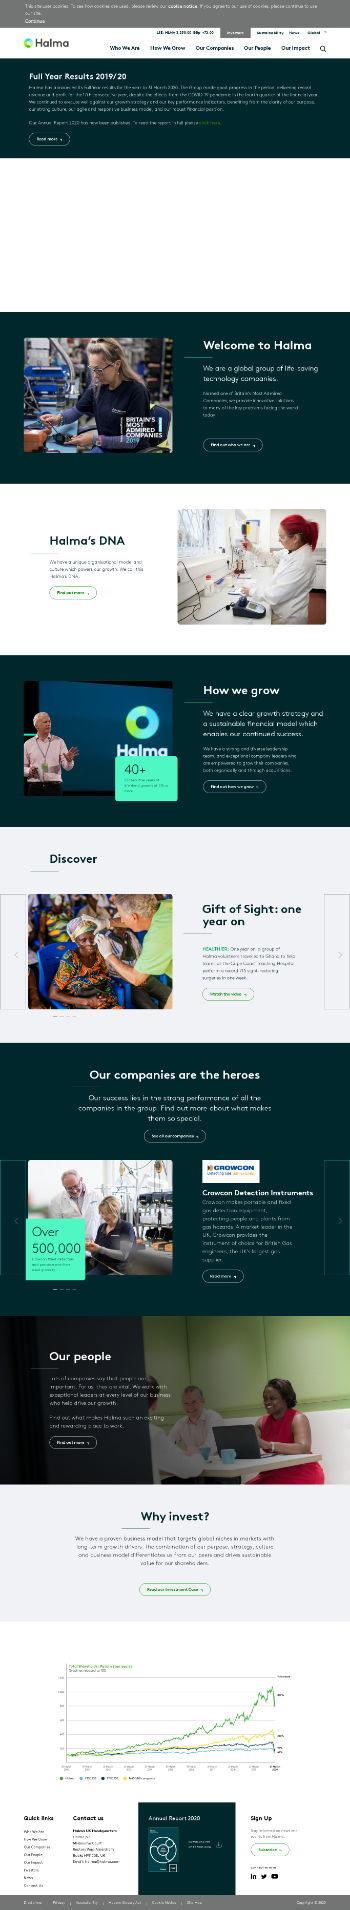 Halma plc Website Screenshot